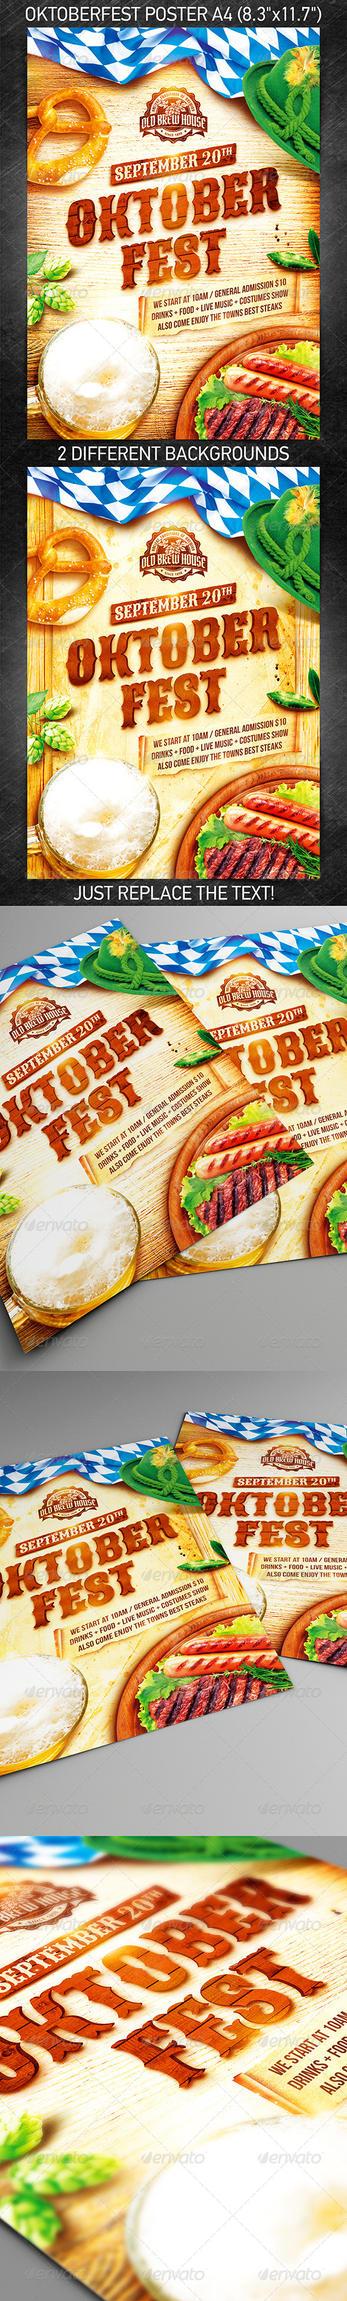 Oktoberfest Festival Poster vol.3, PSD Template by 4ustudio